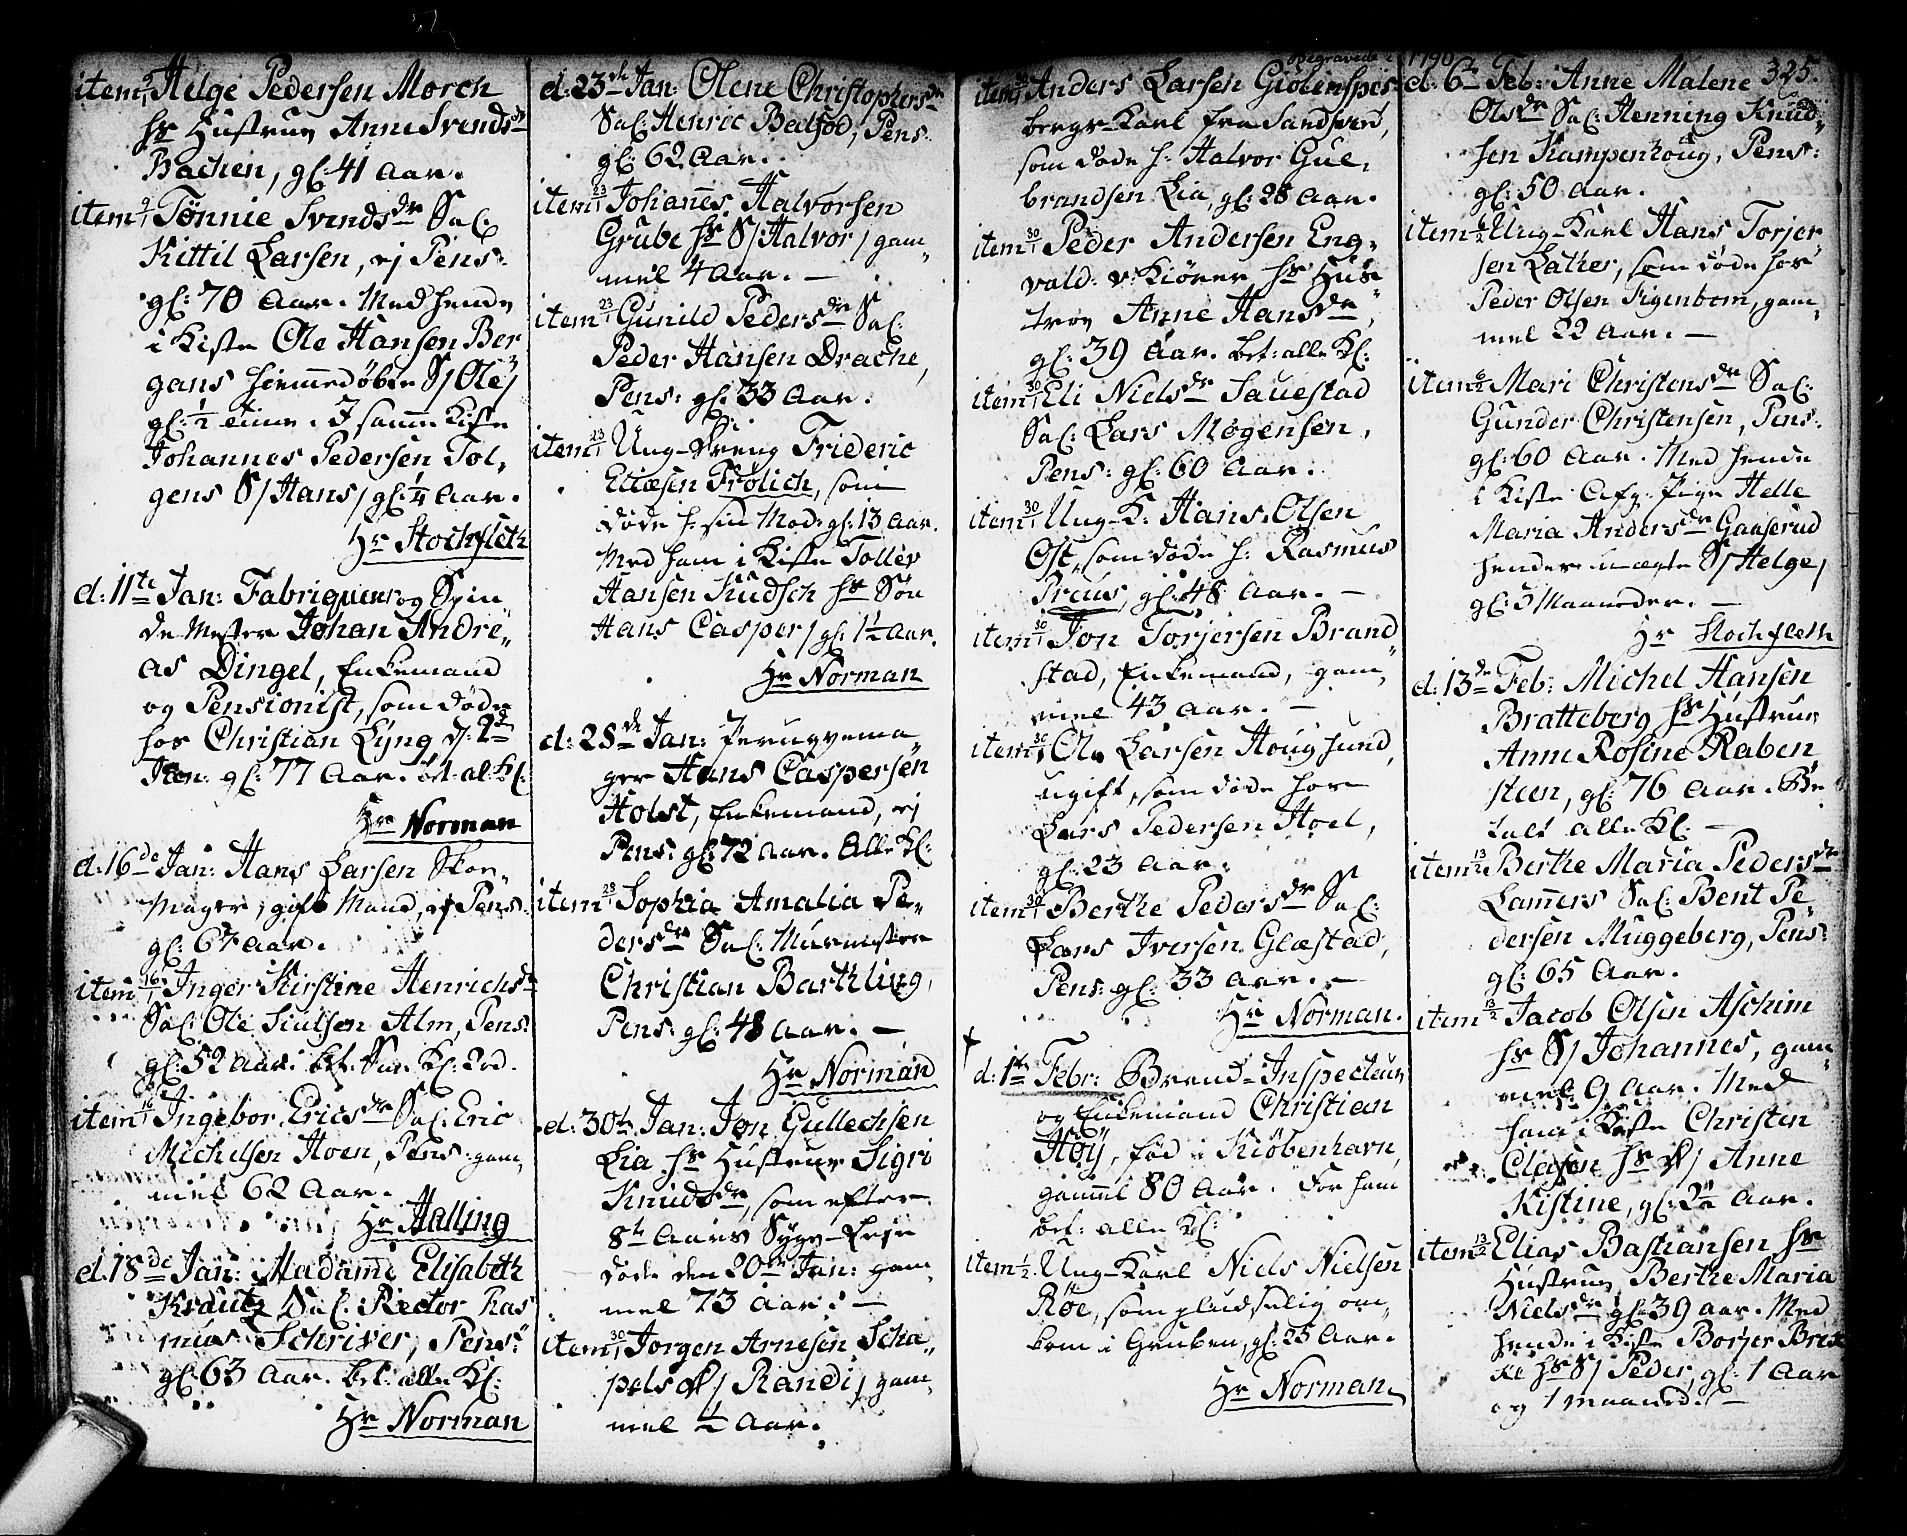 SAKO, Kongsberg kirkebøker, F/Fa/L0006: Parish register (official) no. I 6, 1783-1797, p. 325